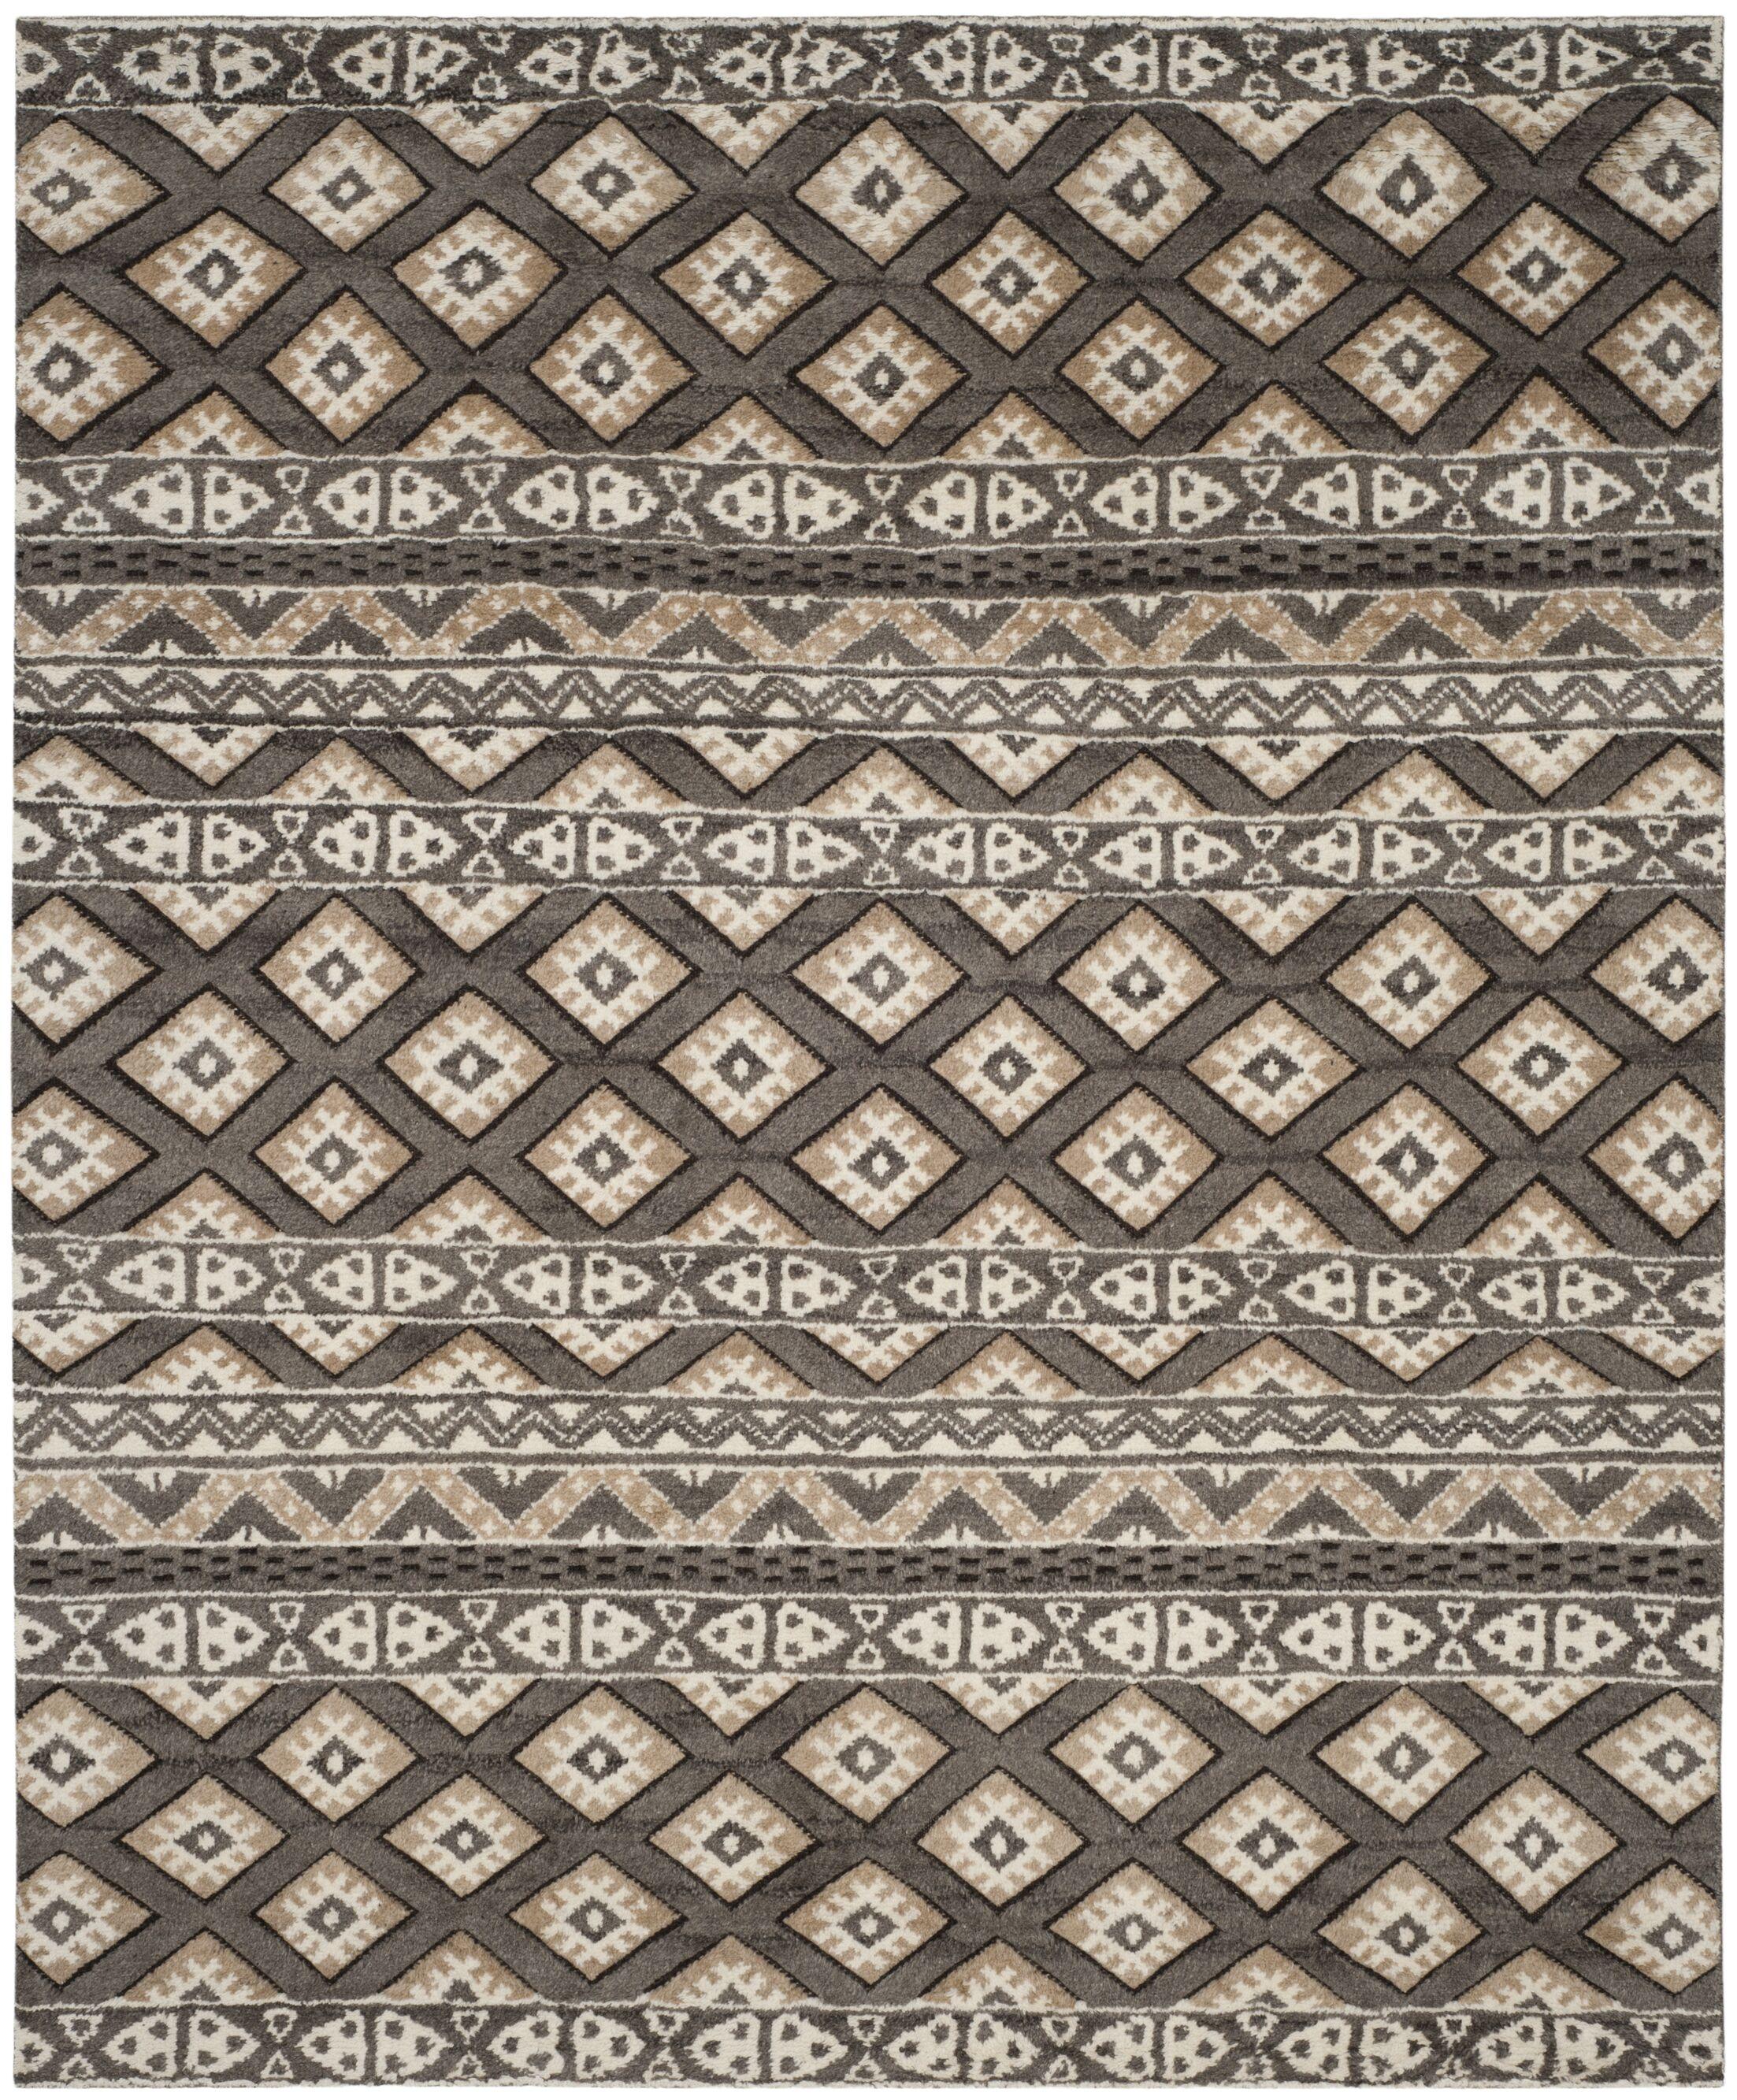 Eldert Hand-Knotted Beige Area Rug Rug Size: Rectangle 8' x 10'